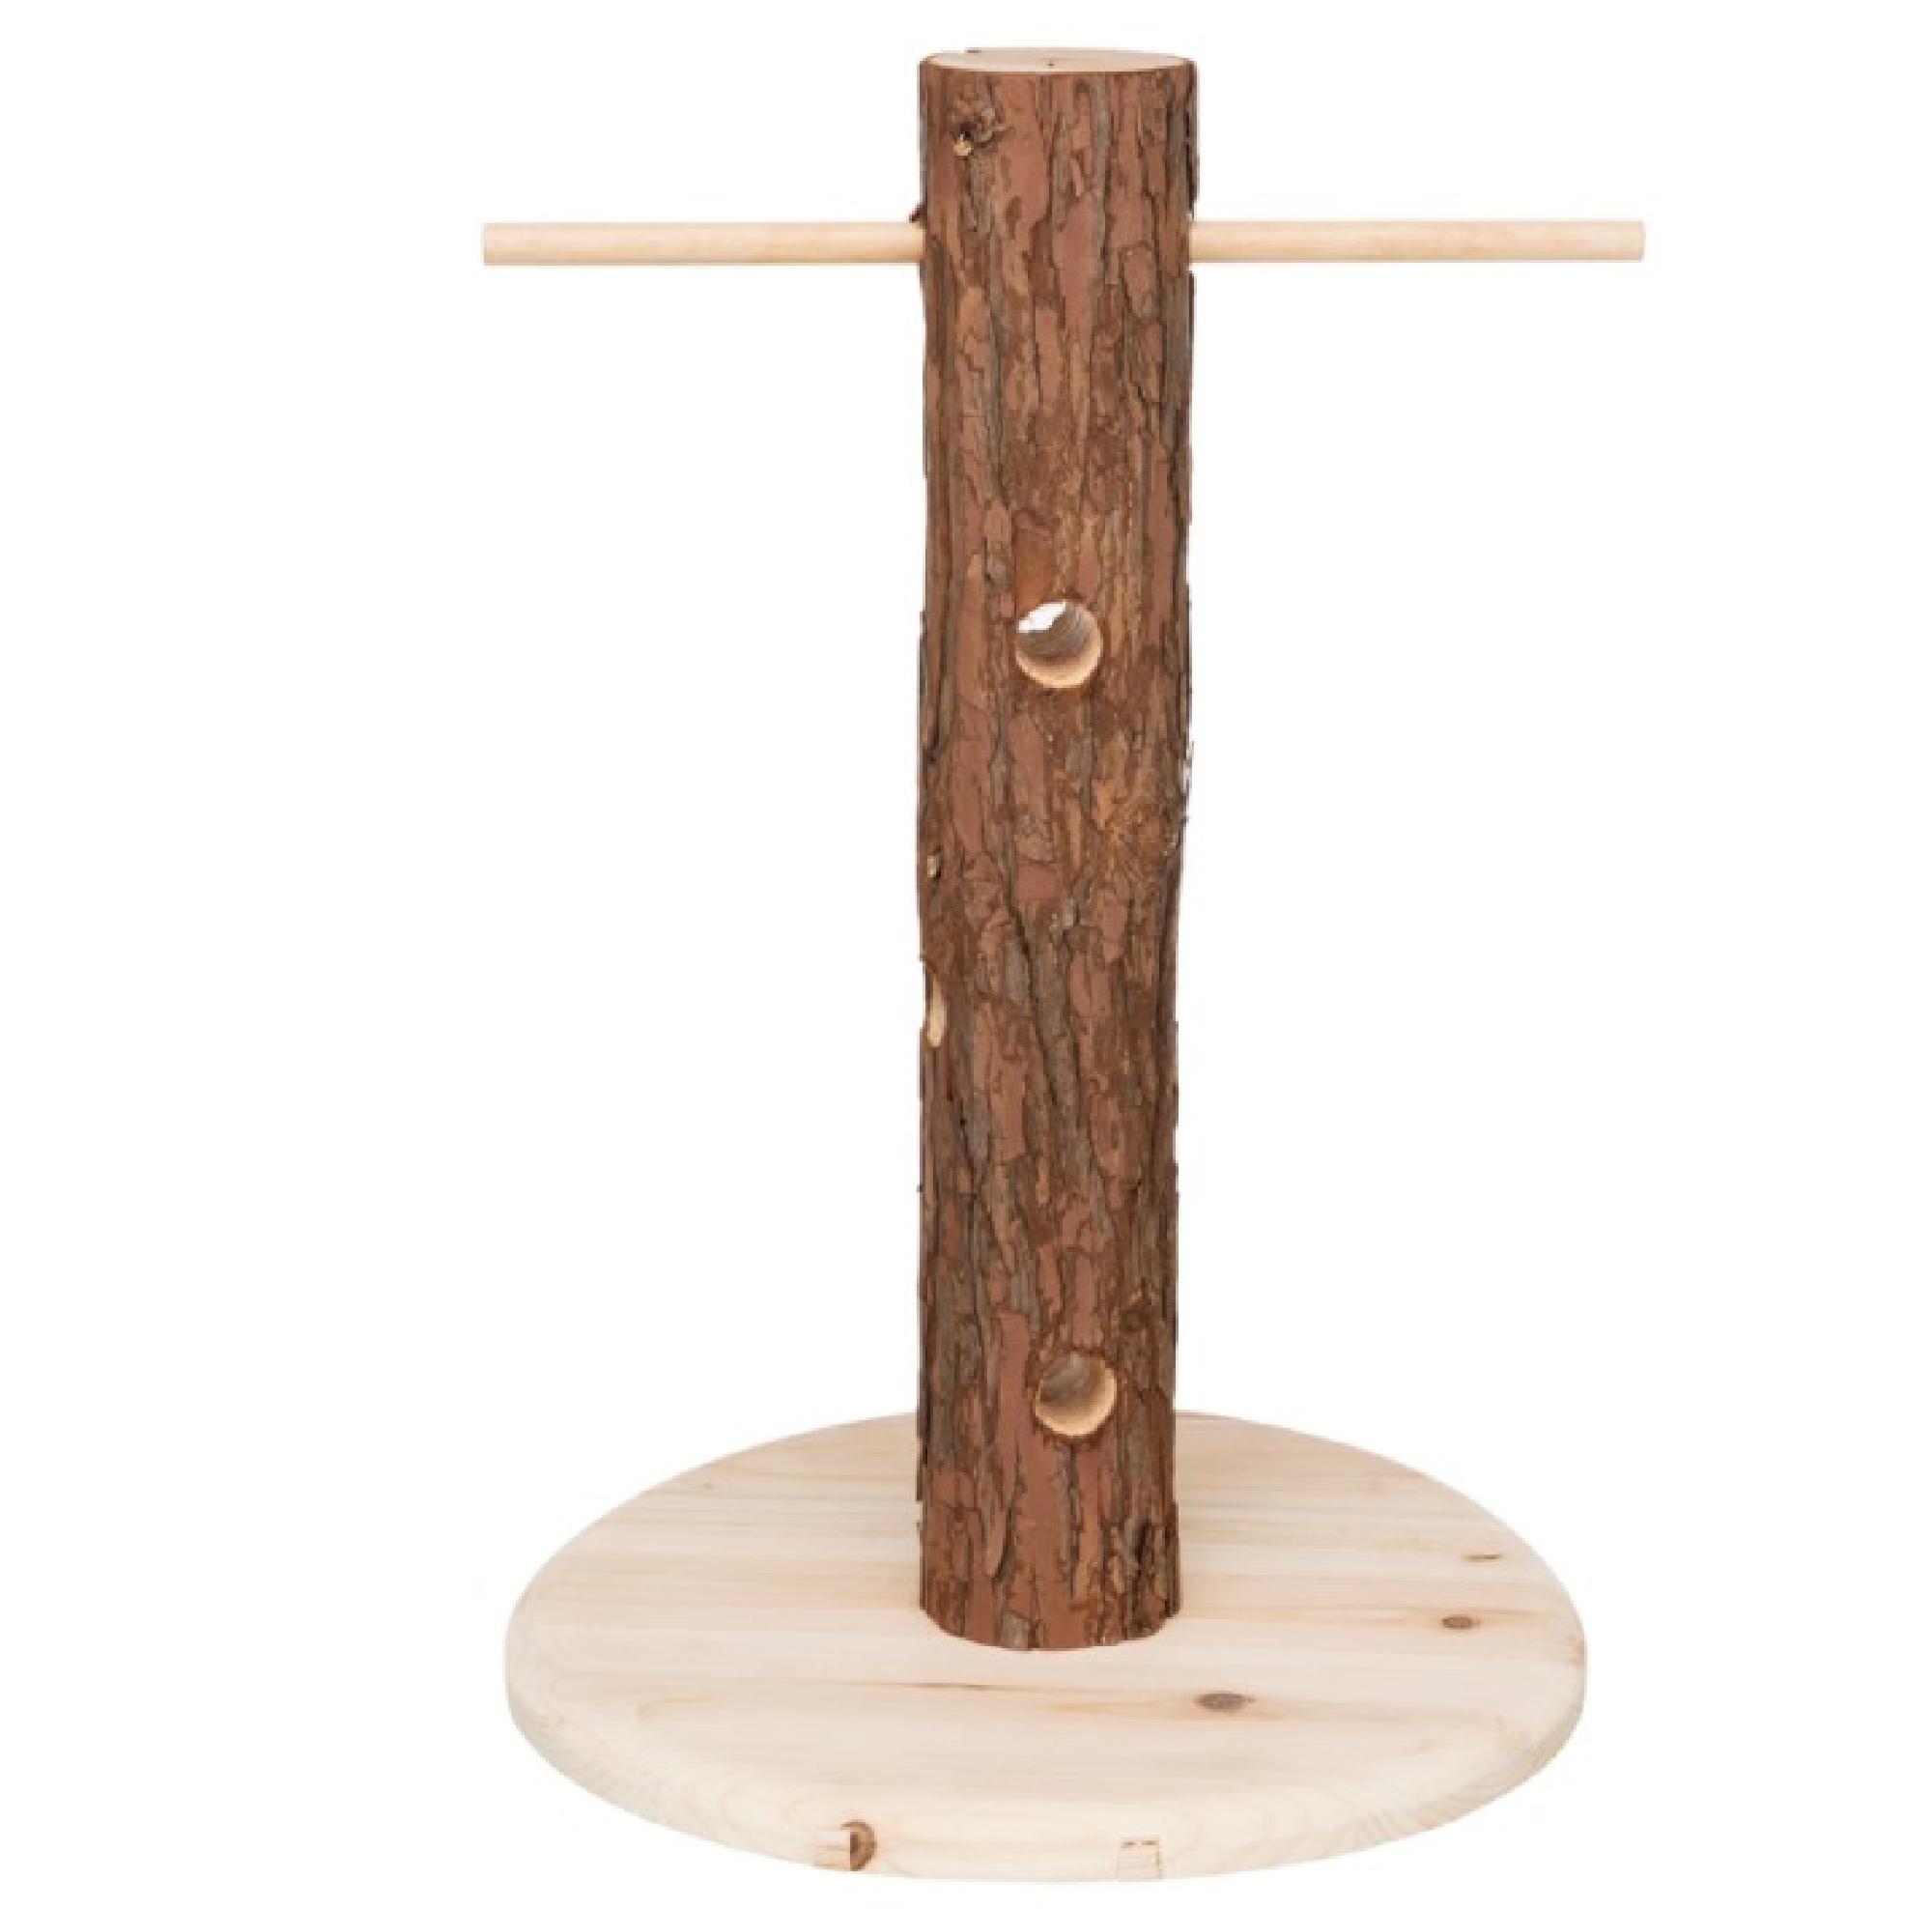 Foderträ 25 × 36 cm